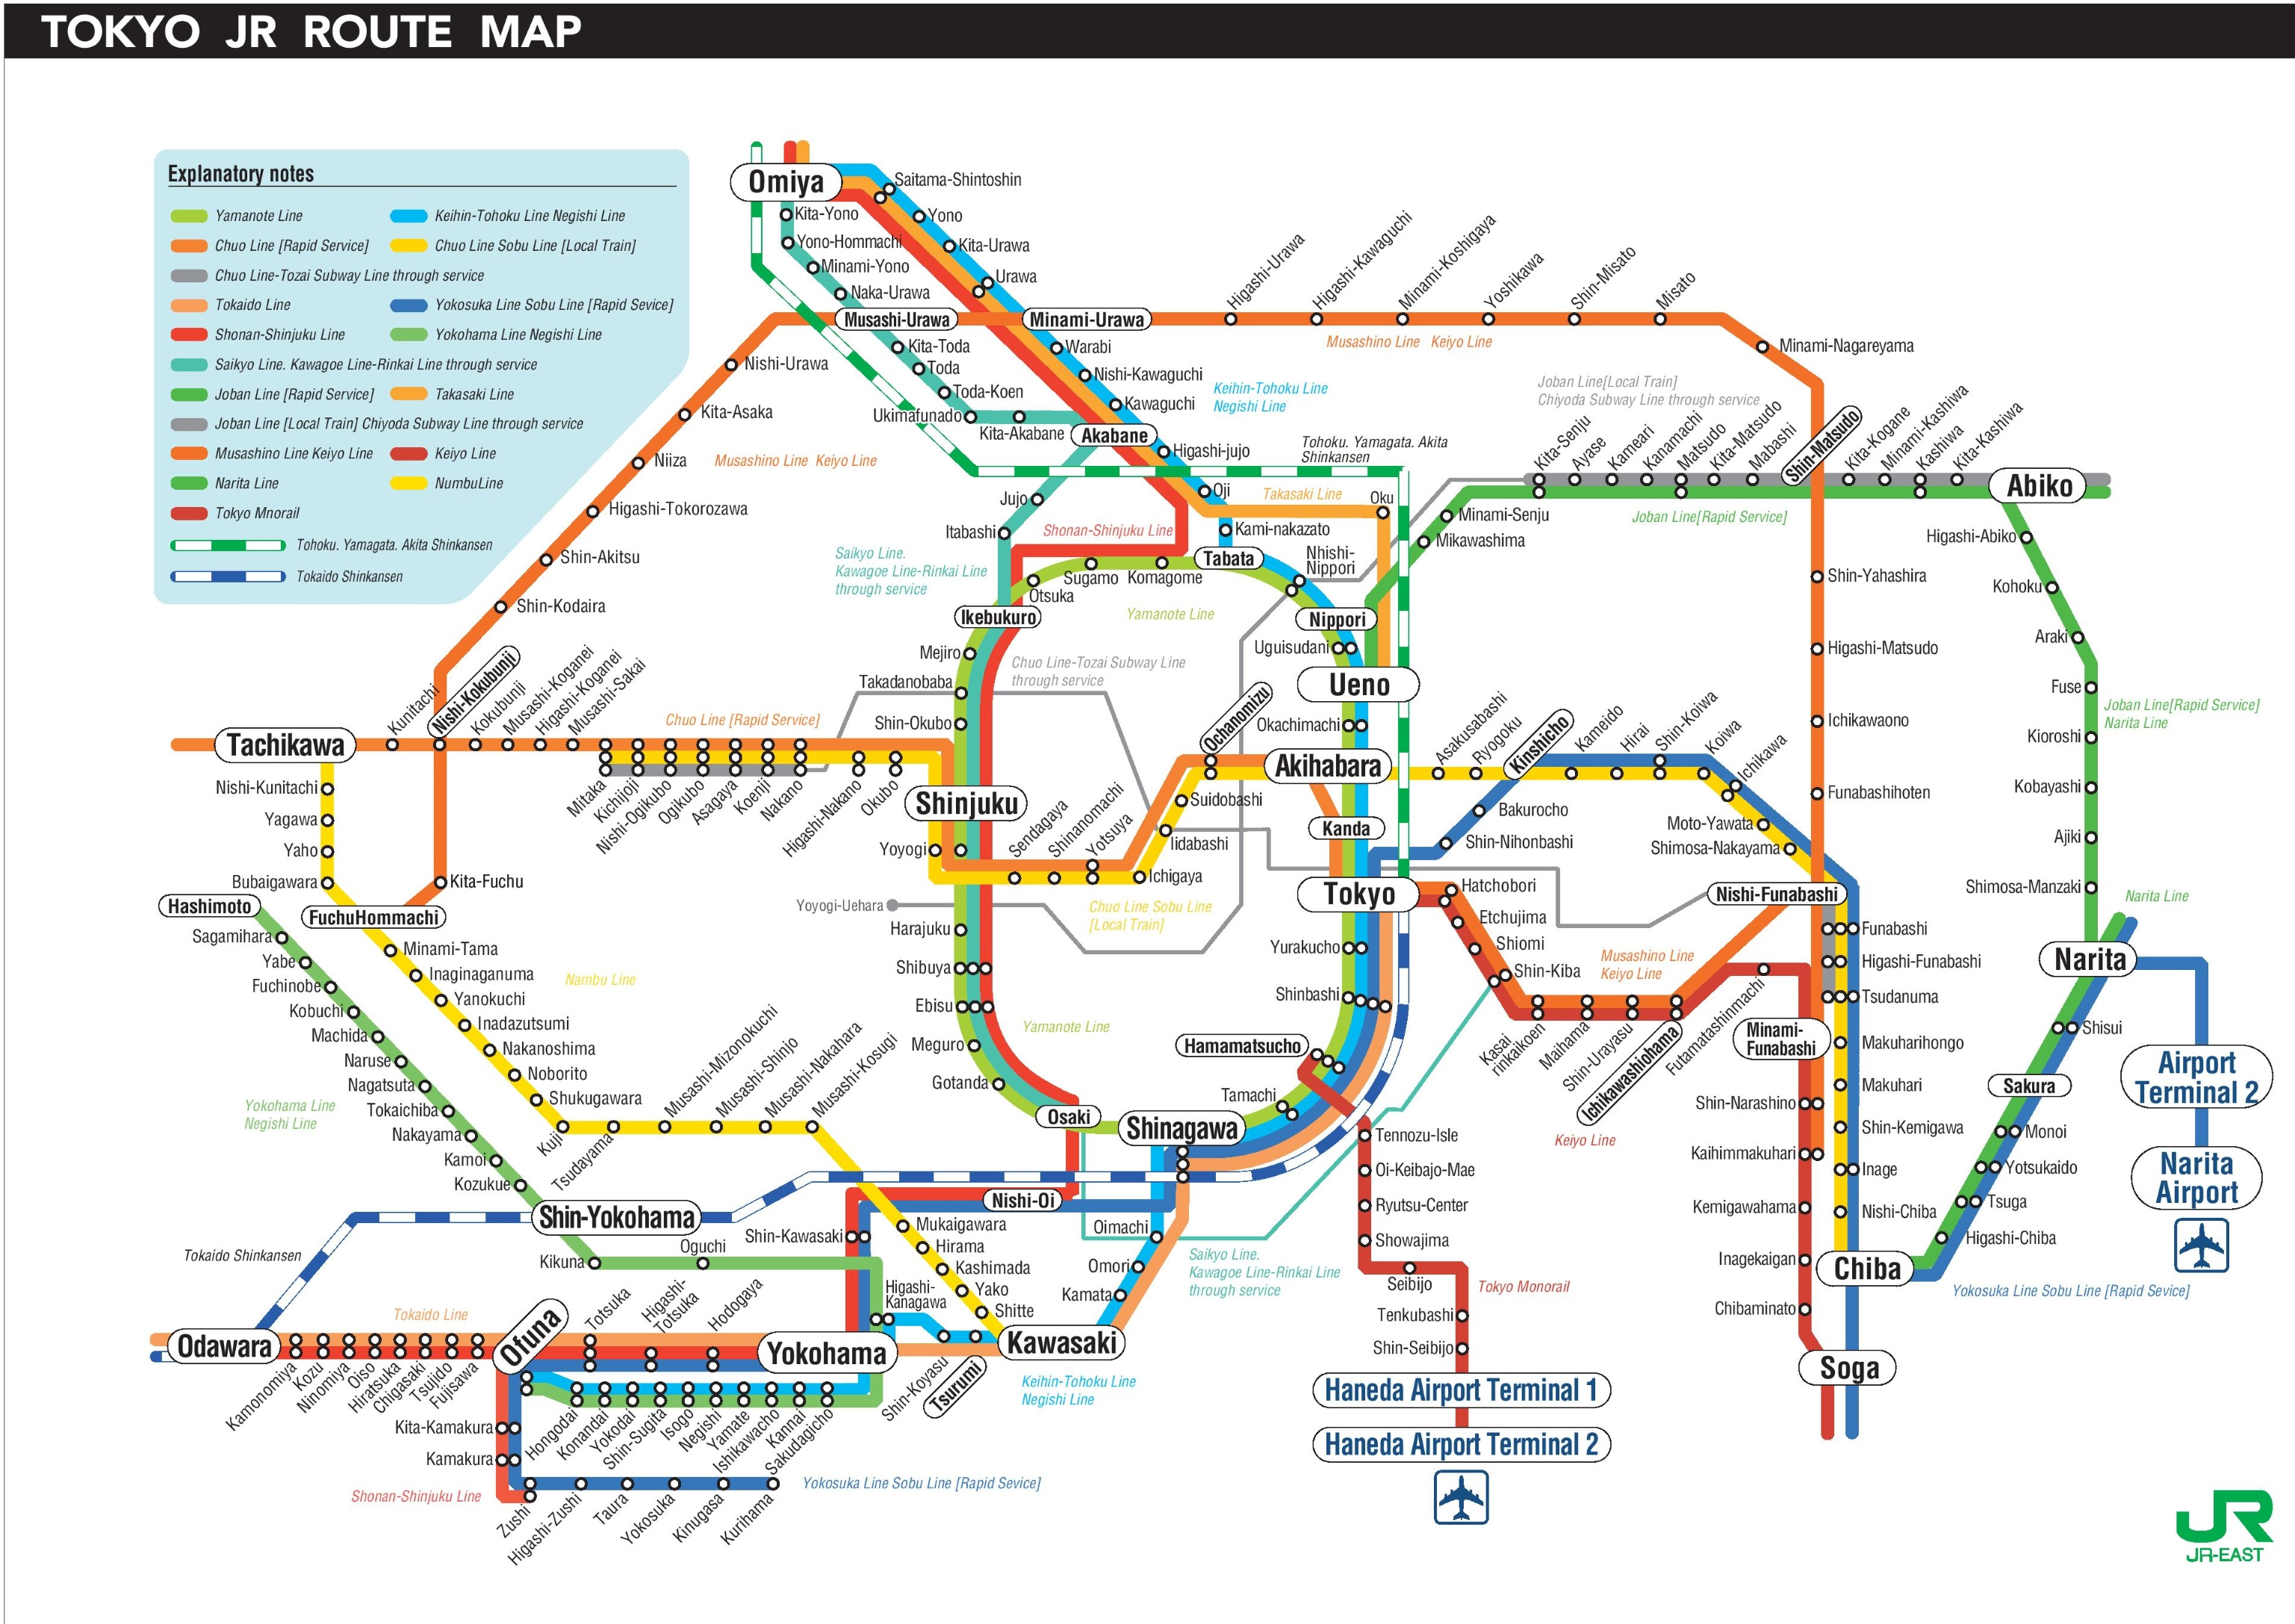 Tokyo Jr Map Tokyo JR map